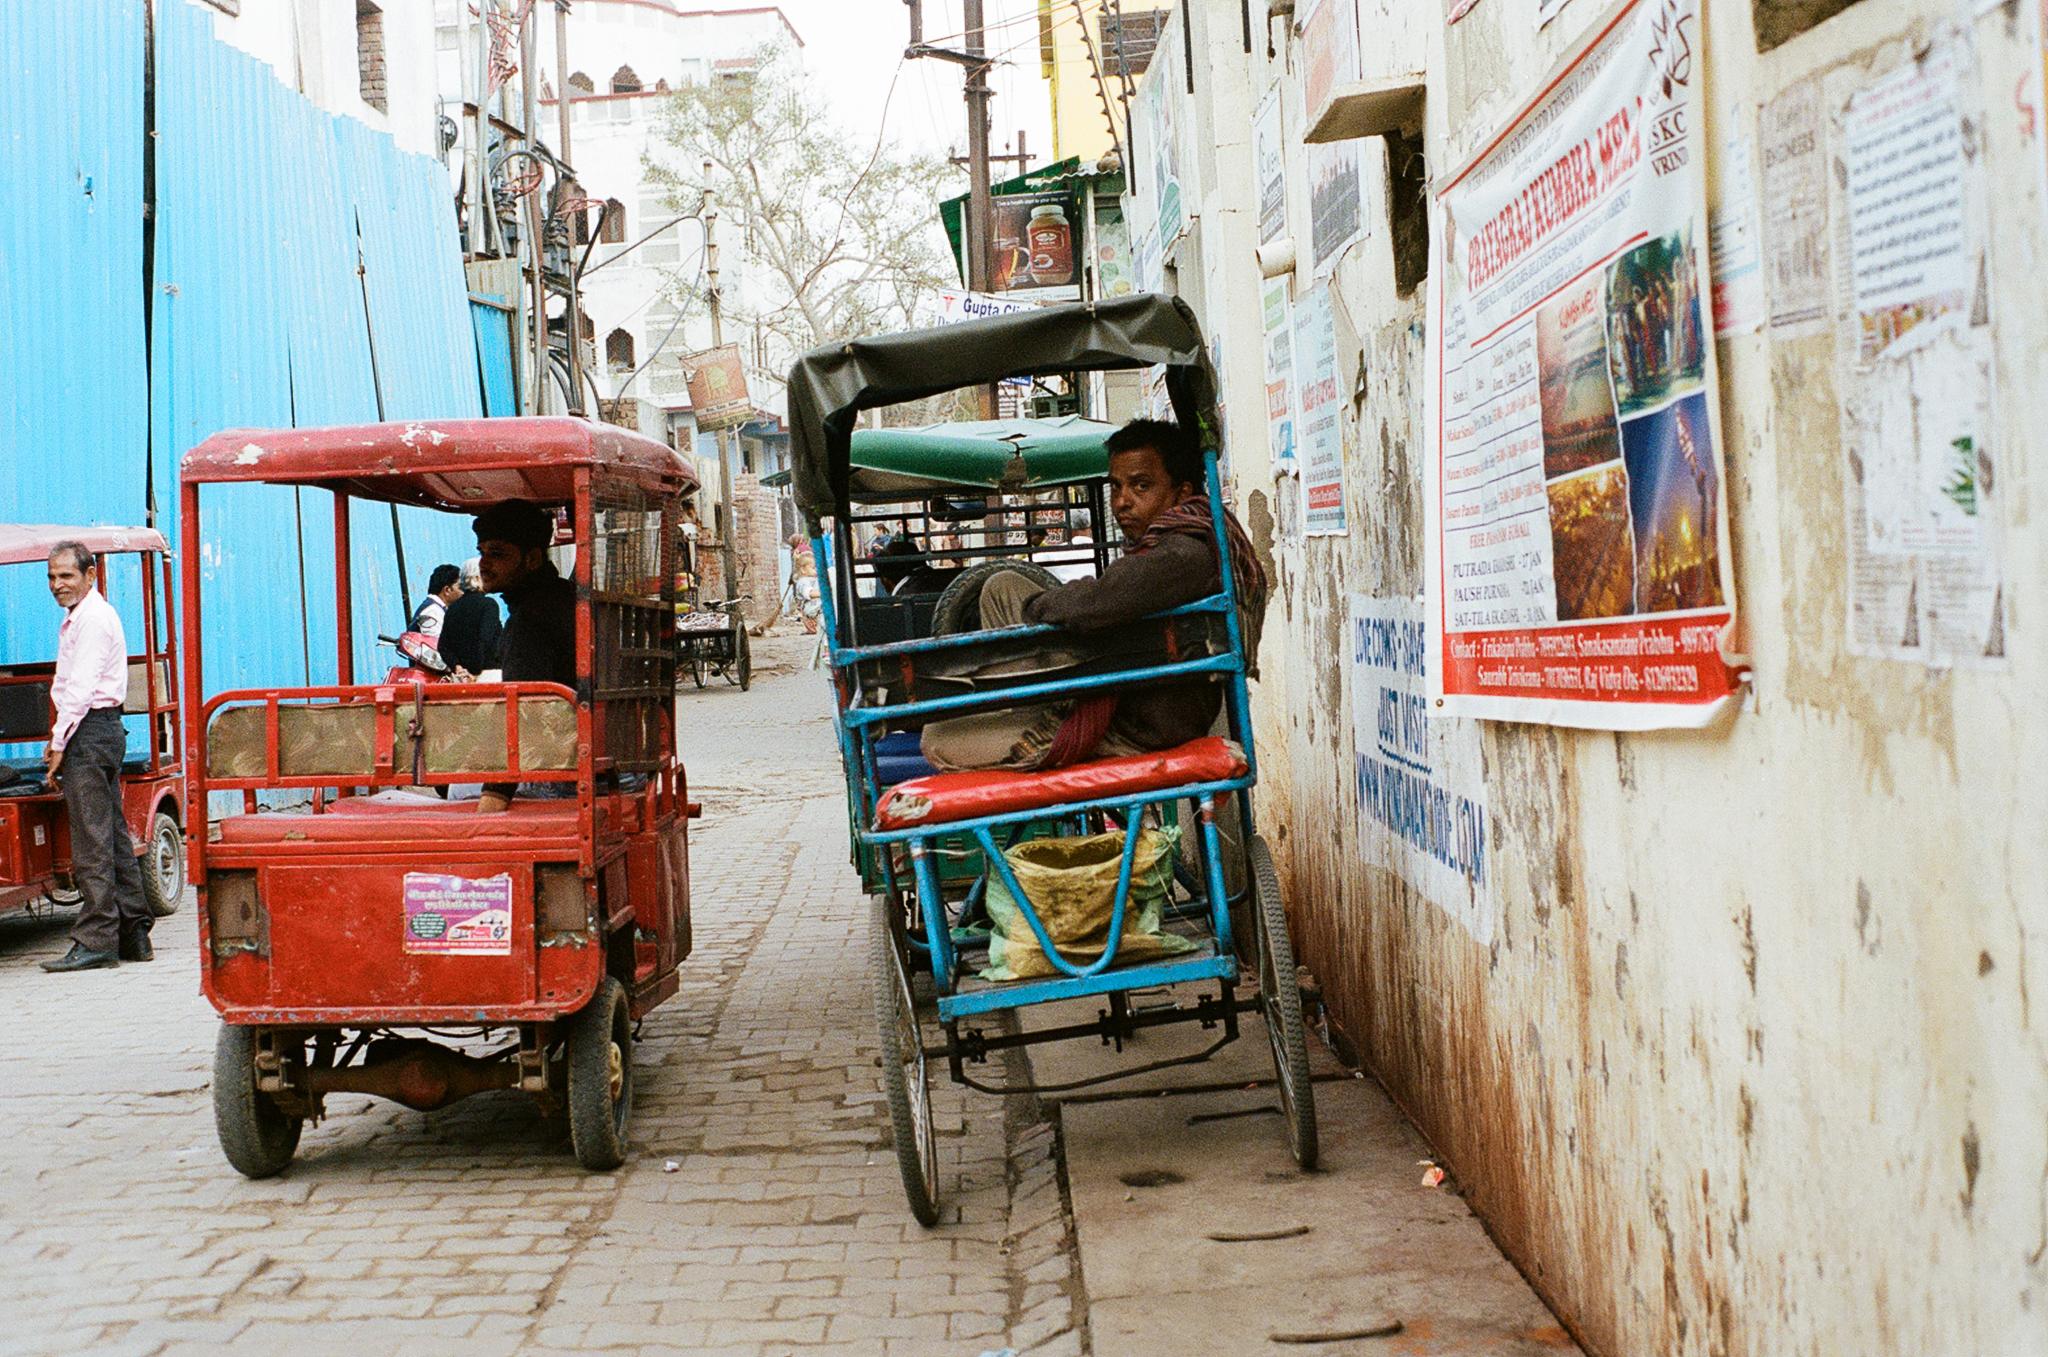 Vrindavan India Travel Street Photography (22 of 27).jpg